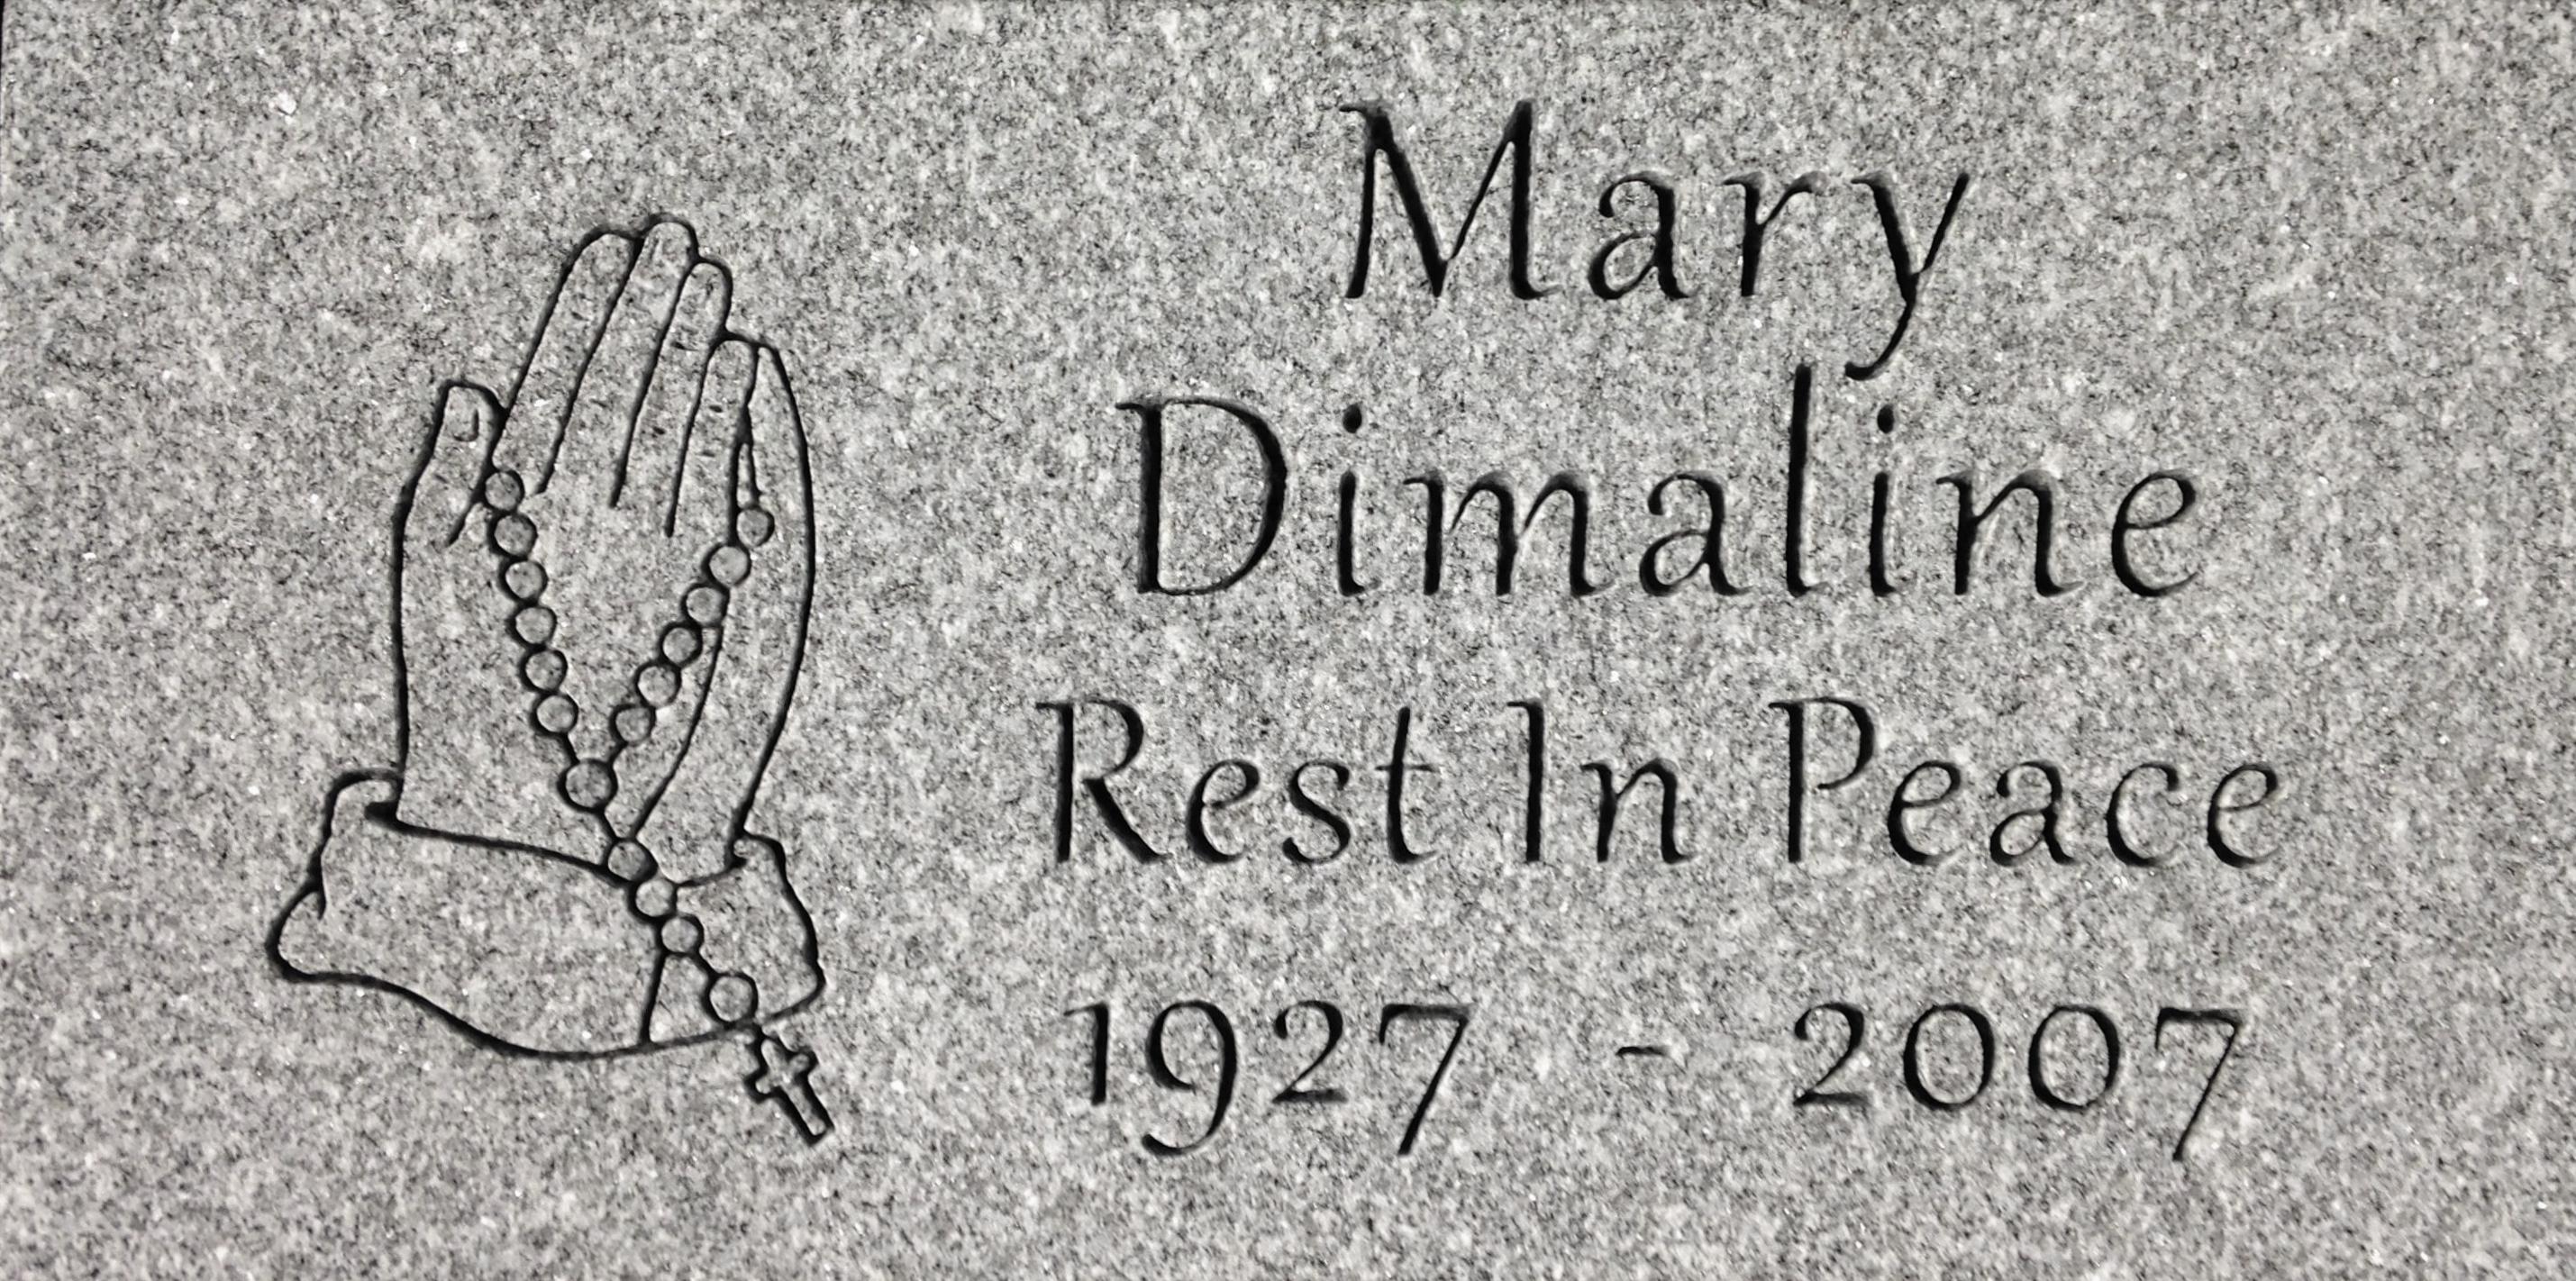 Steeled Barre - Dimaline, MAry 18-2785 -